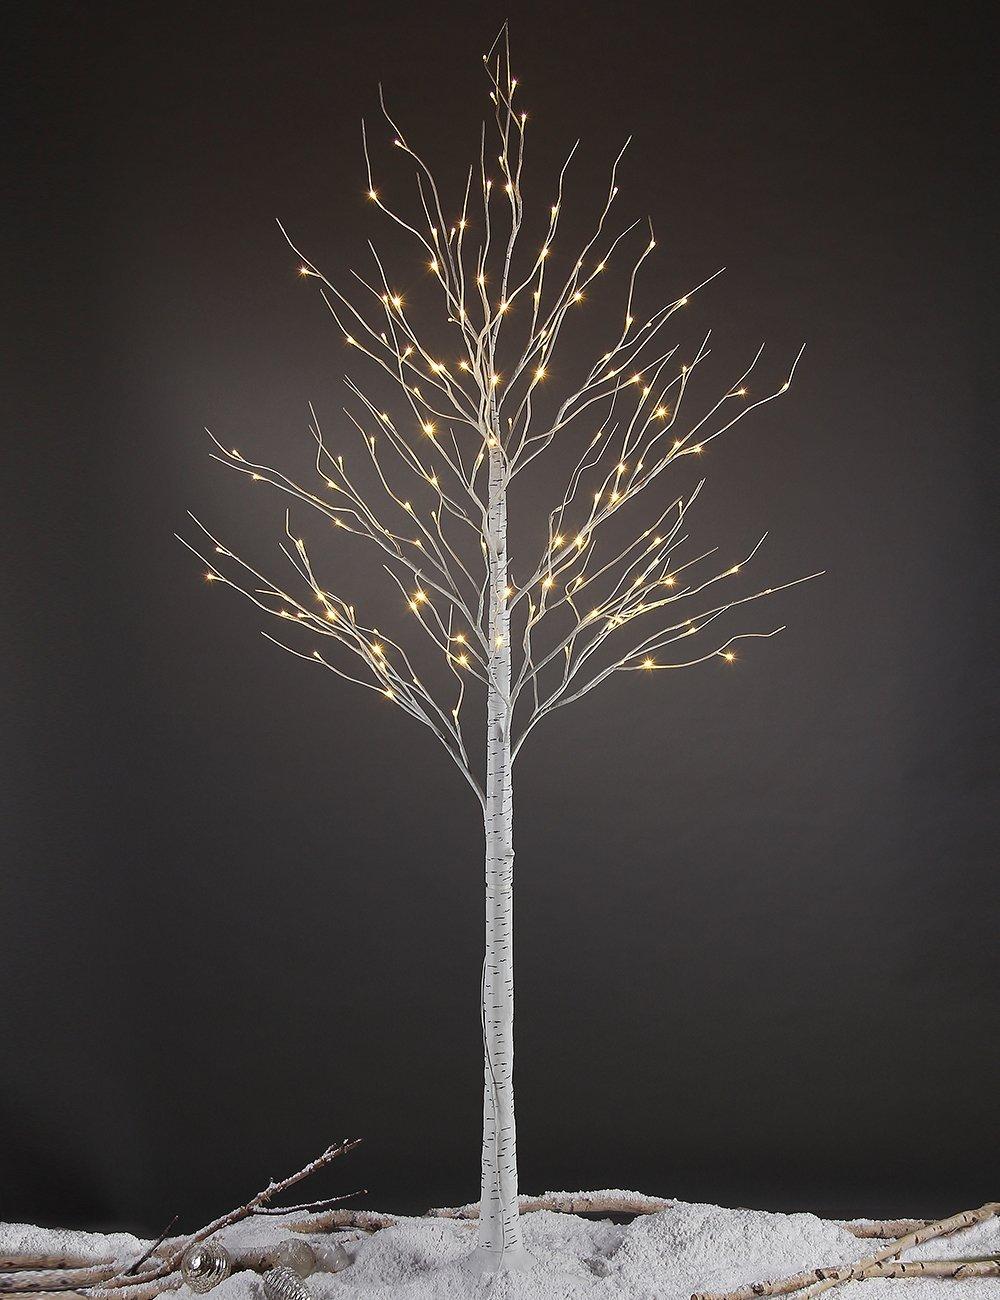 Lightshare 132L LED Birch Tree, 8-Feet